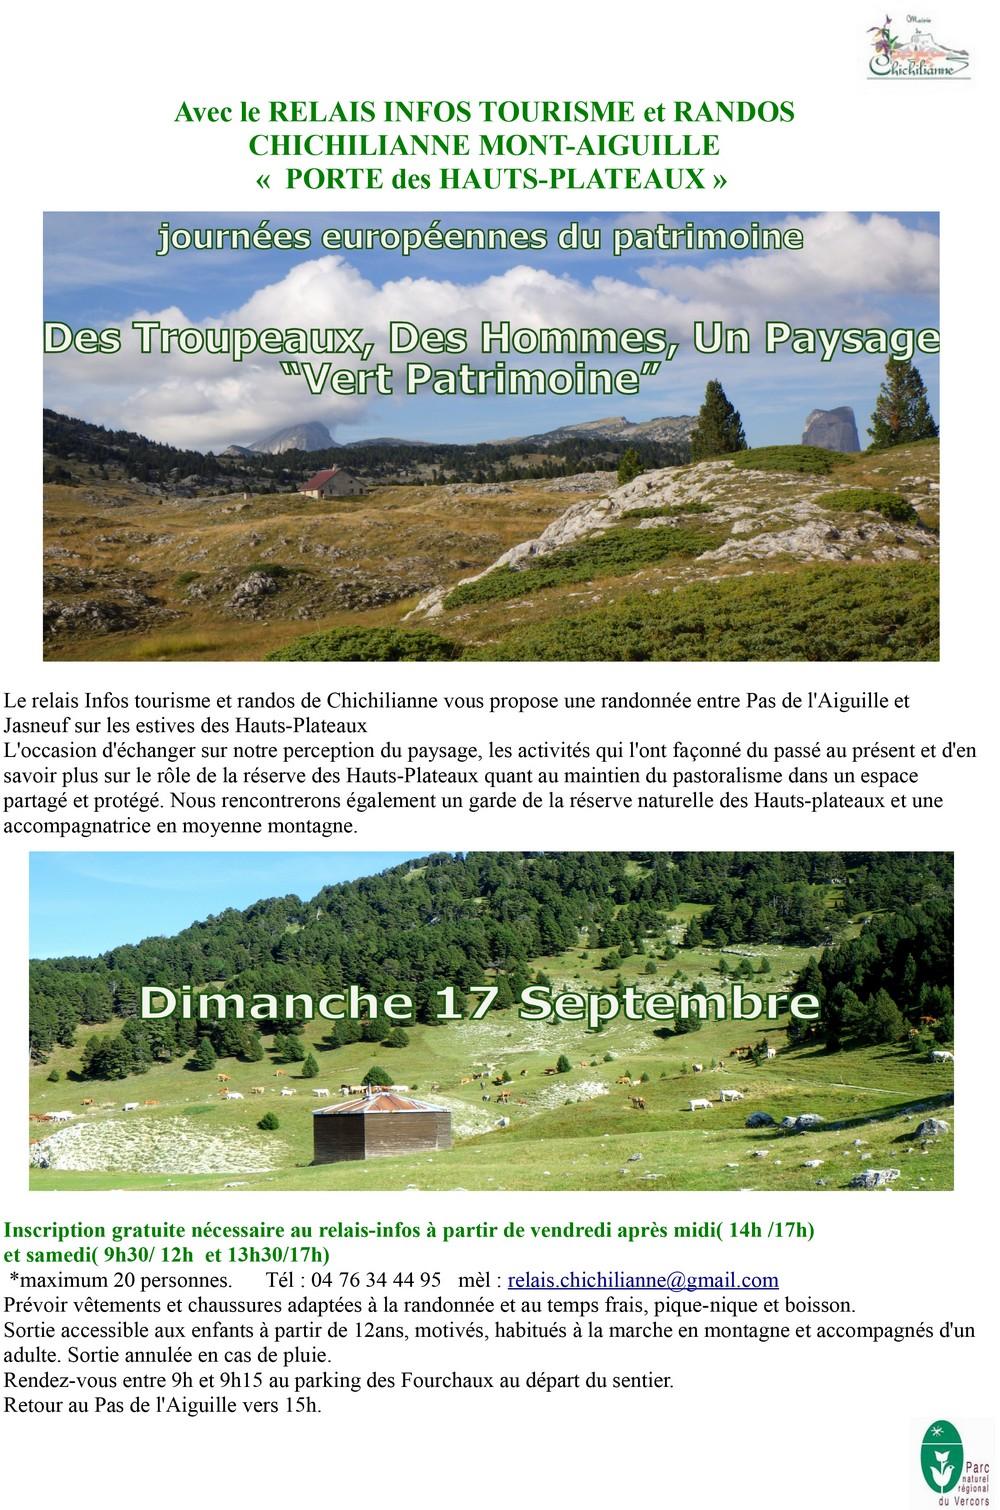 chichilianne-mont-aiguille-vercors-trieves